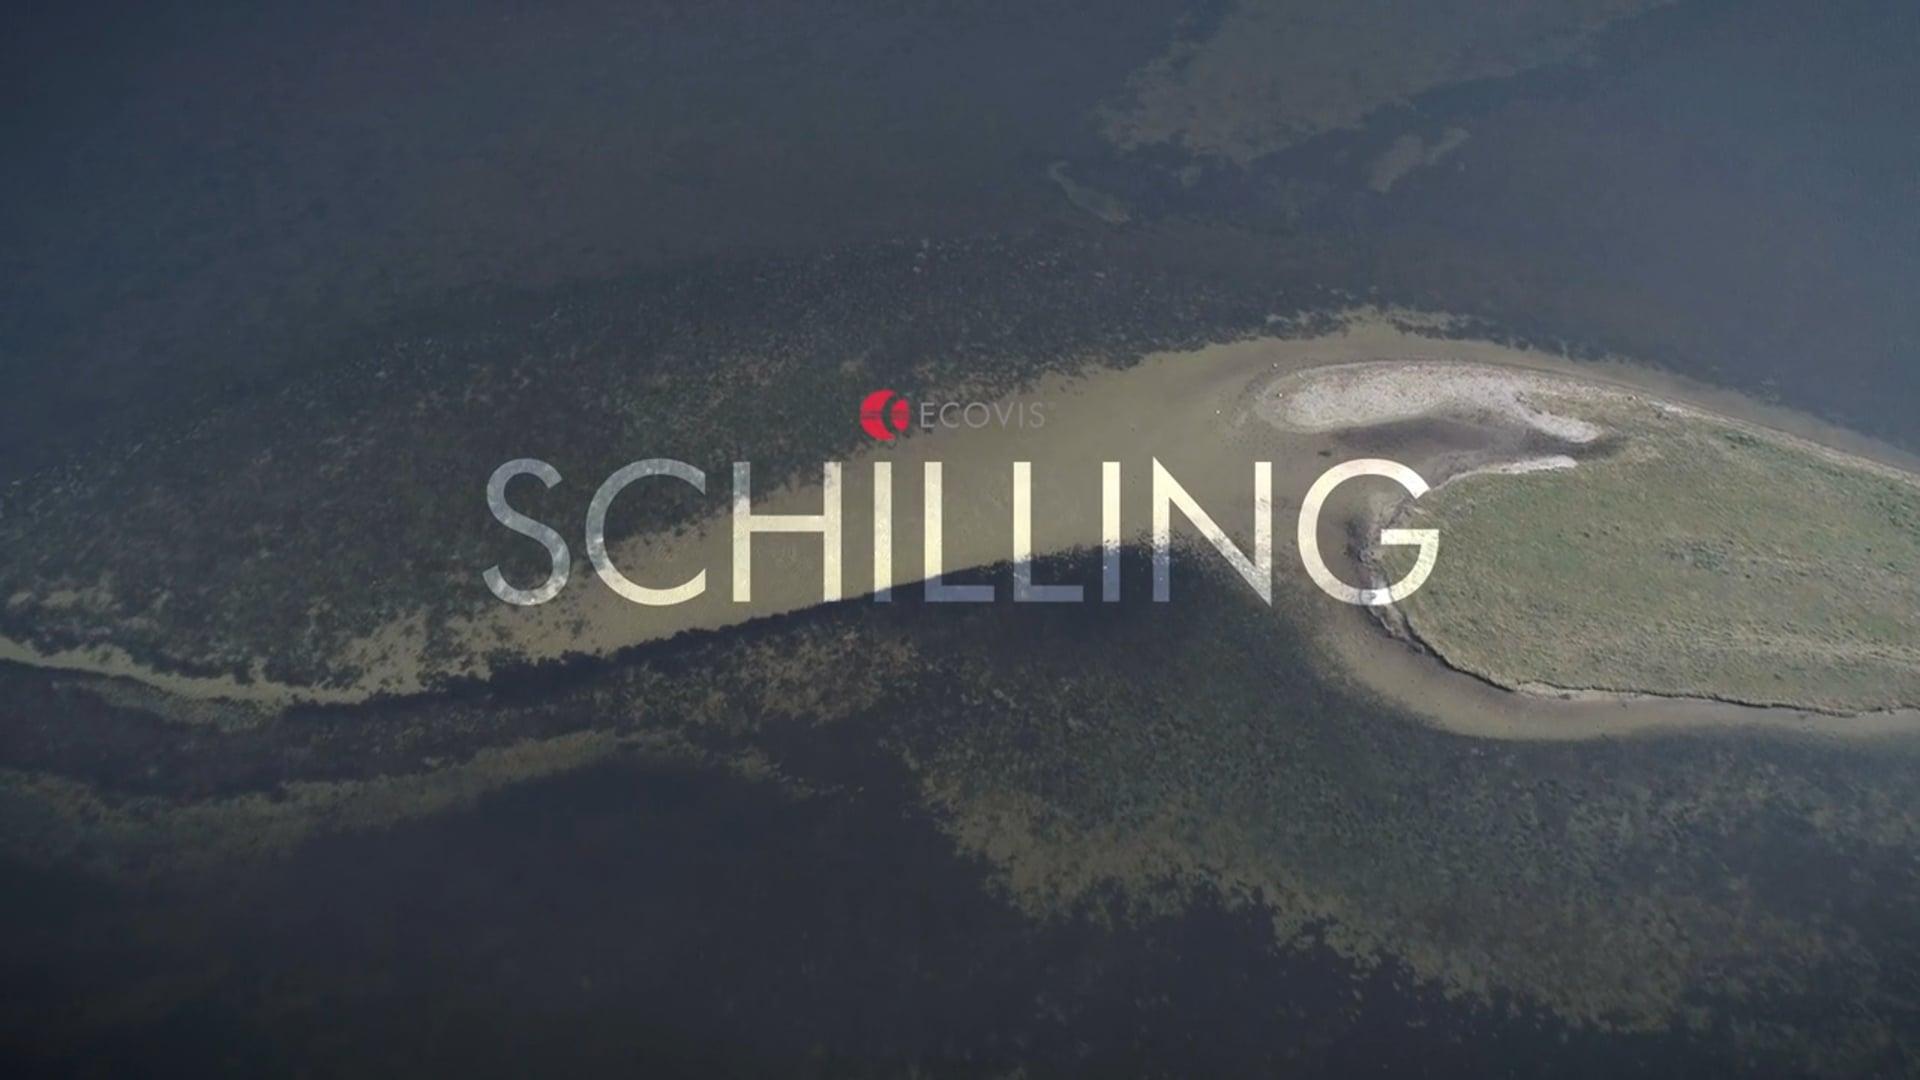 Ecovis - Schilling